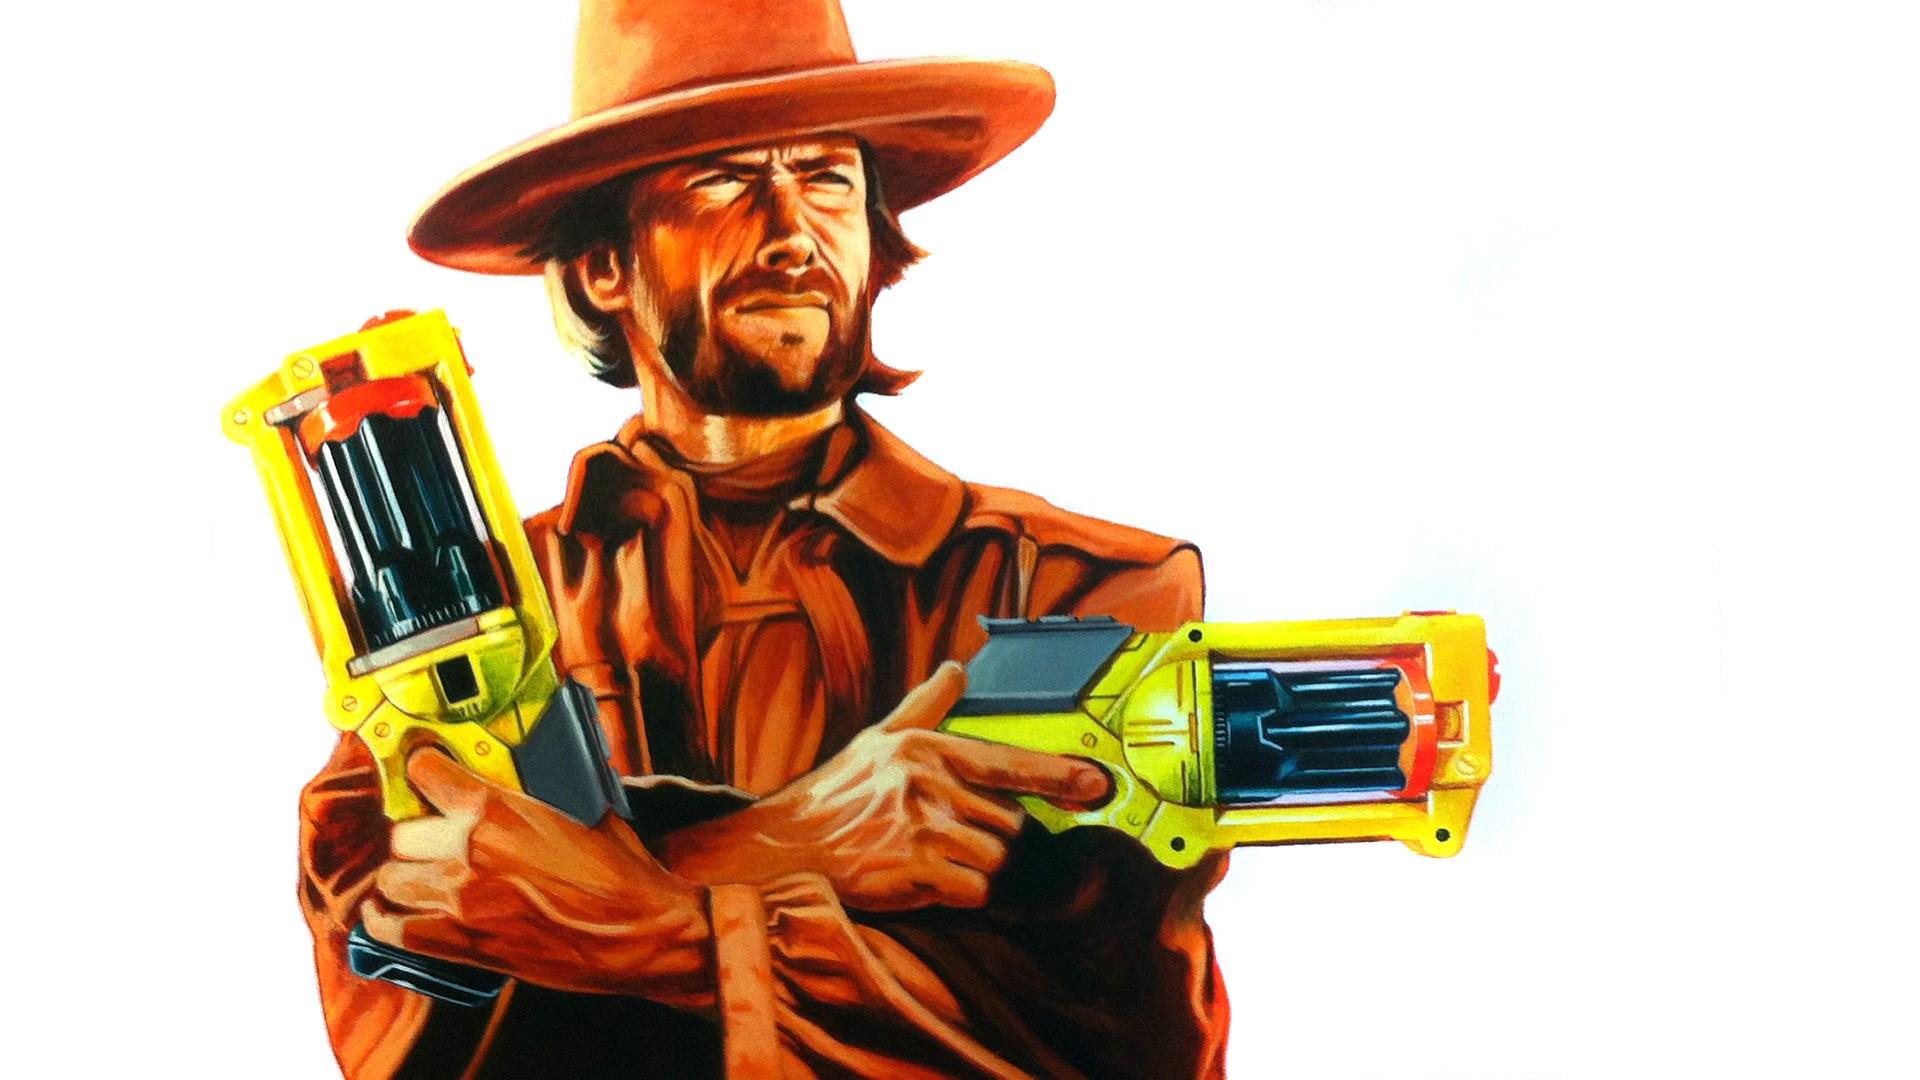 Wallpaper illustration humor artwork toy person - Nerf wallpaper ...